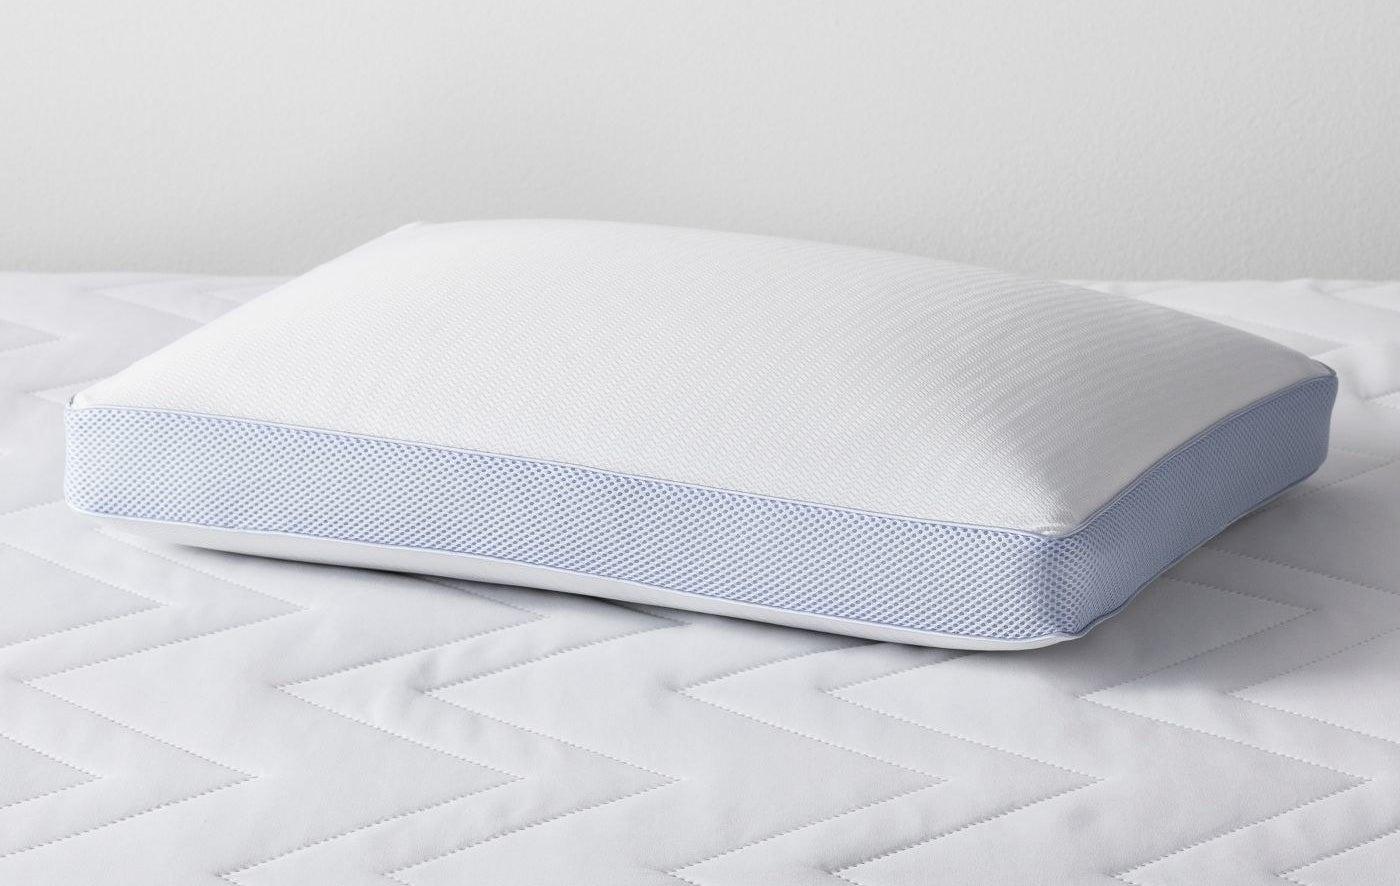 White memory foam pillow on top of a white mattress